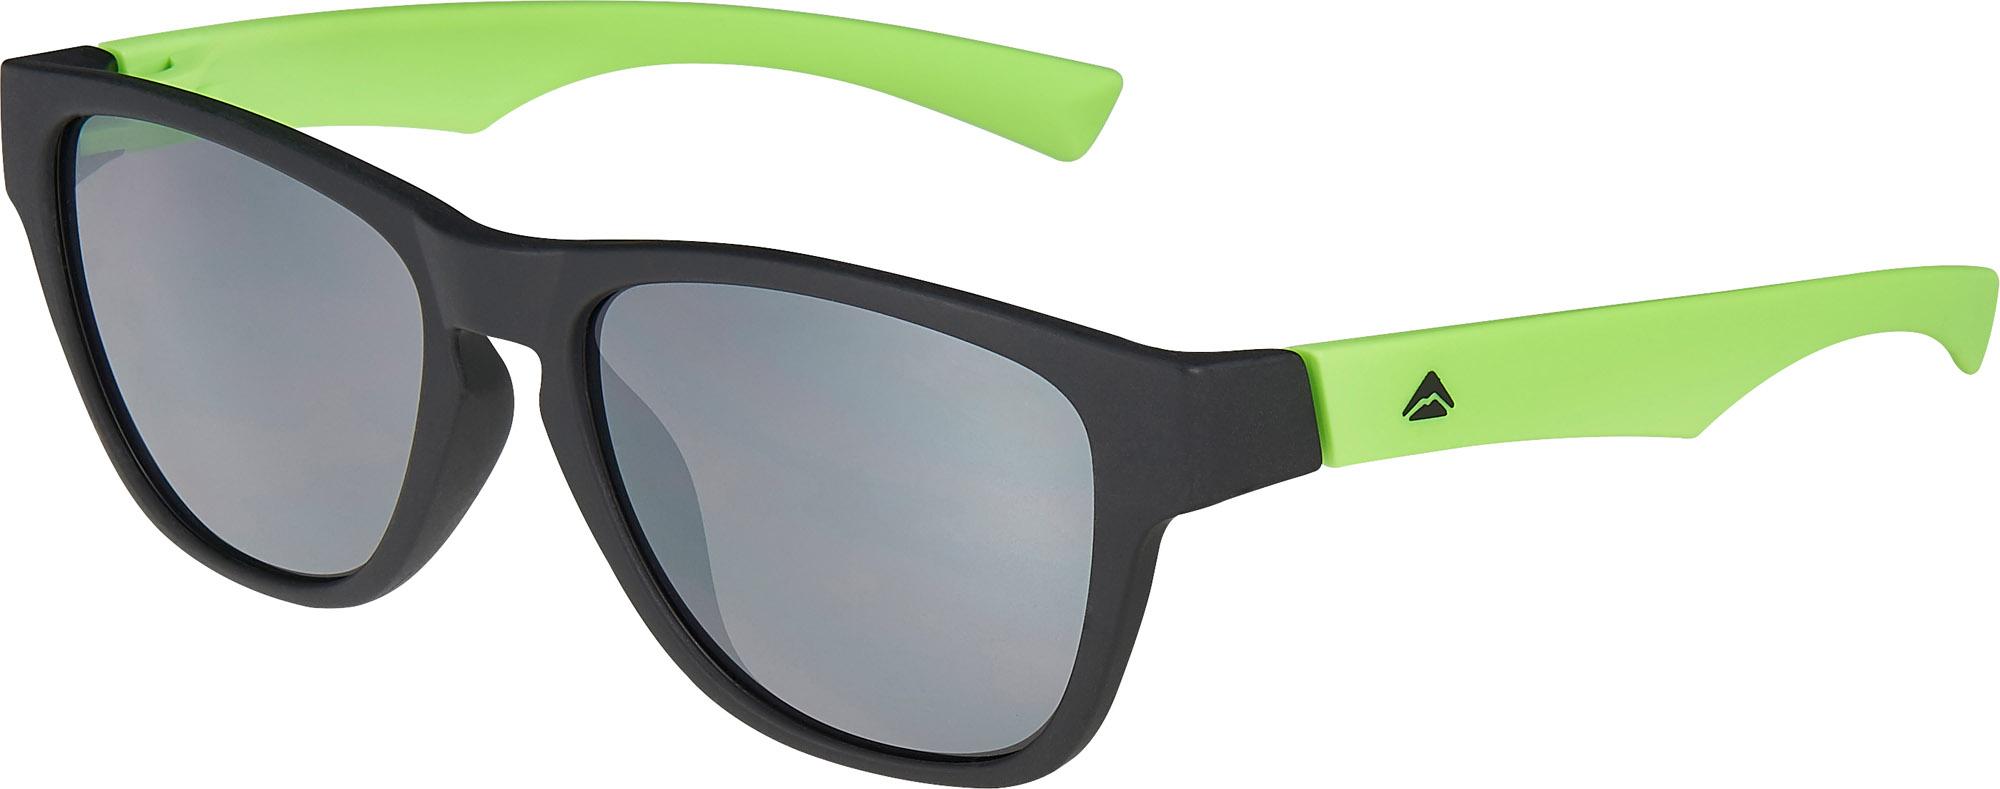 Szemüveg MERIDA PROMO zöld - 1356